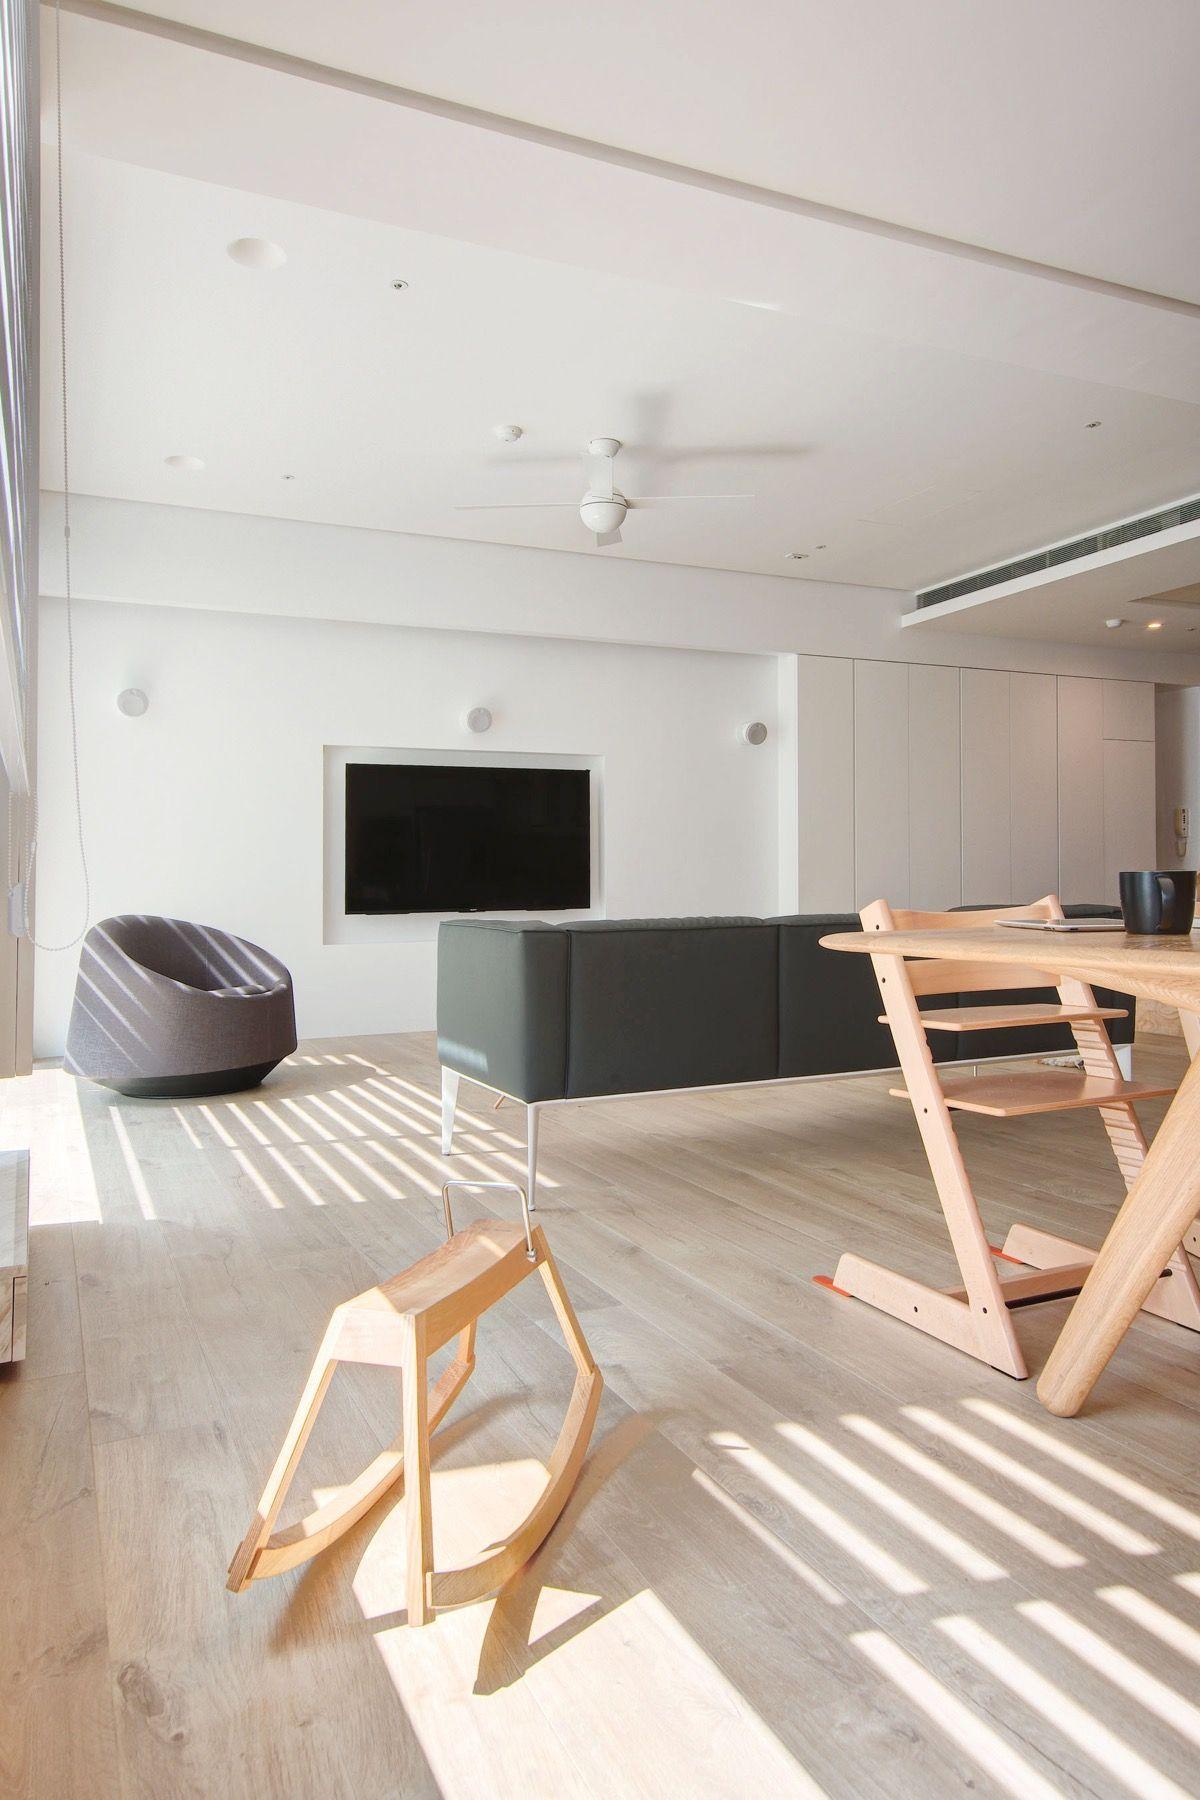 A Minimalist Family Home Design That Doesn\'t Sacrifice Fun | Home ...